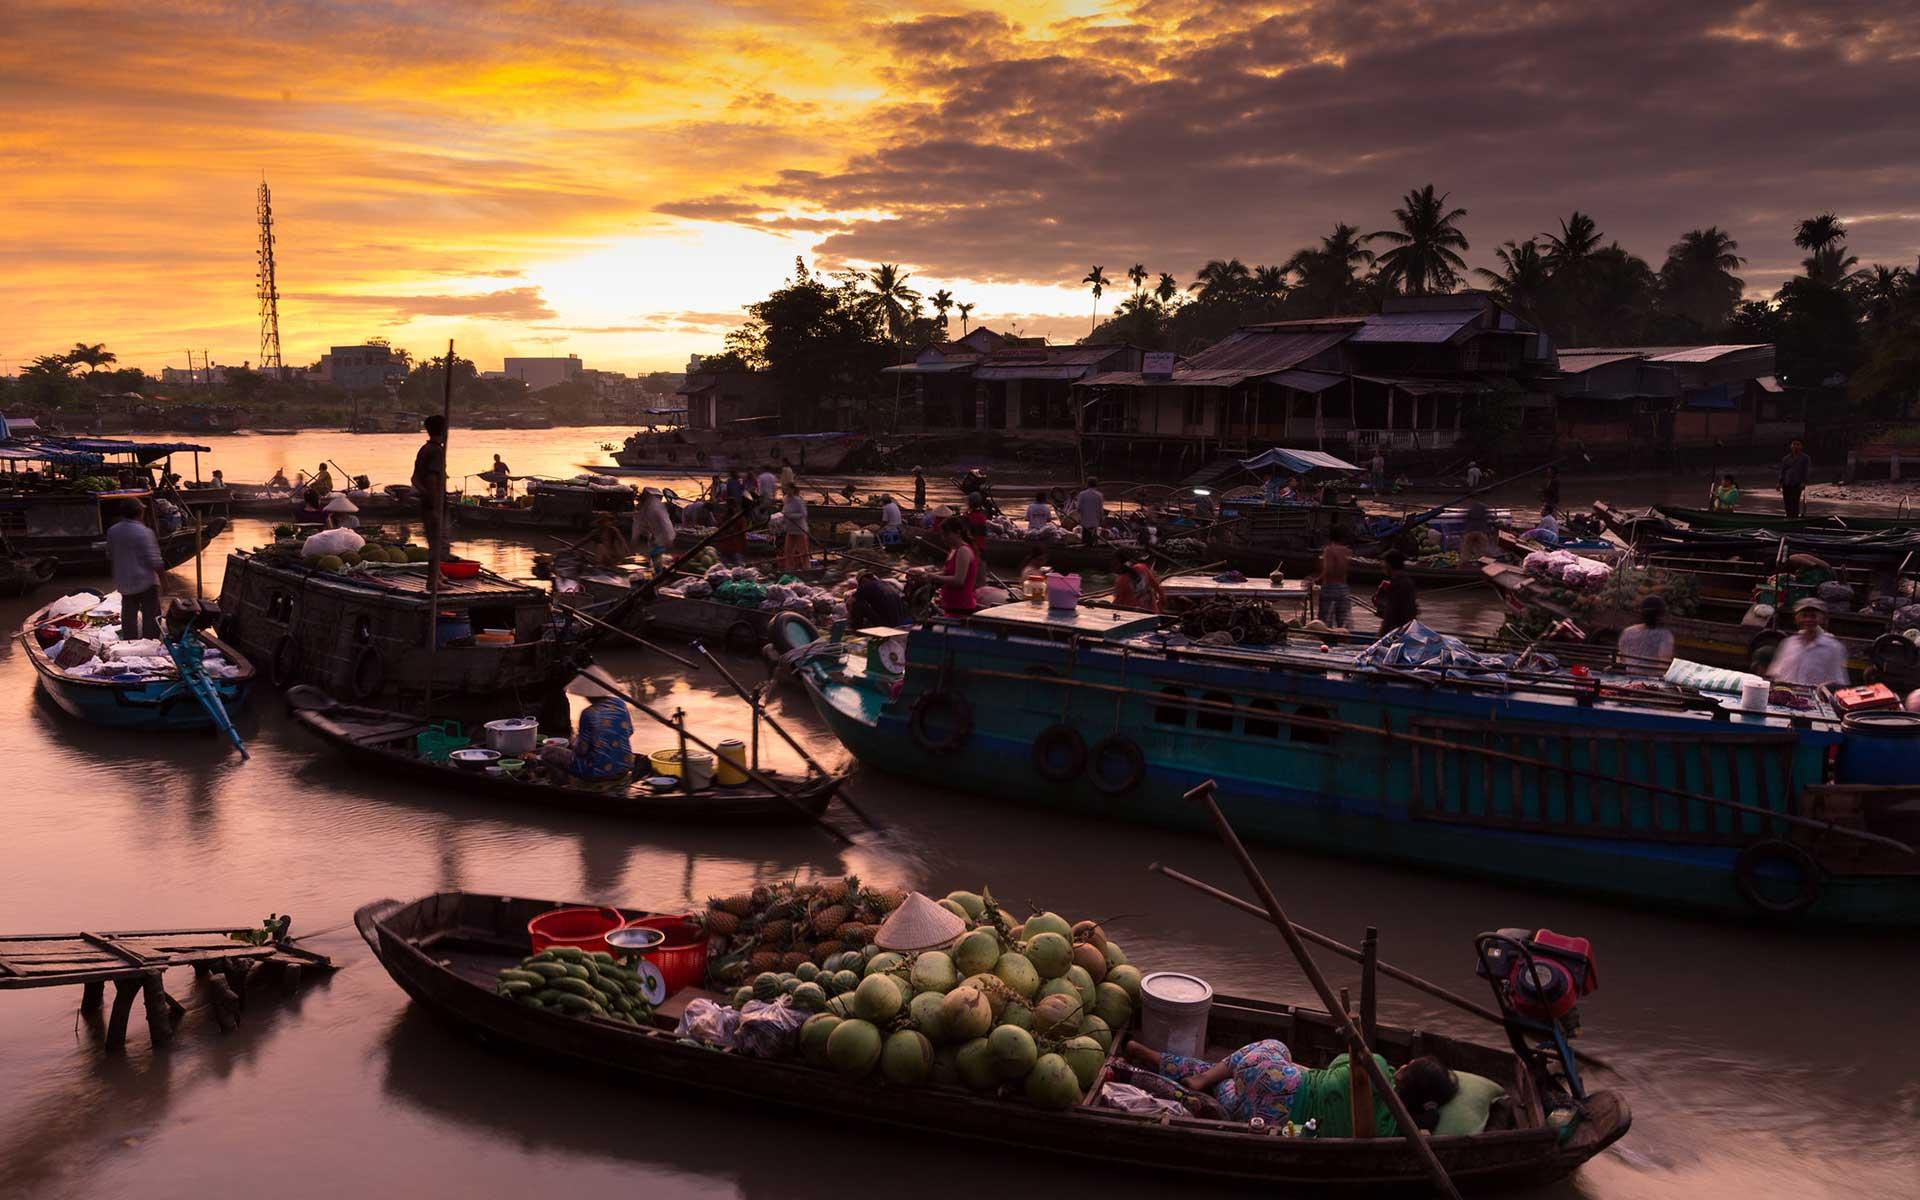 sunset in Phong Dien Floating Market